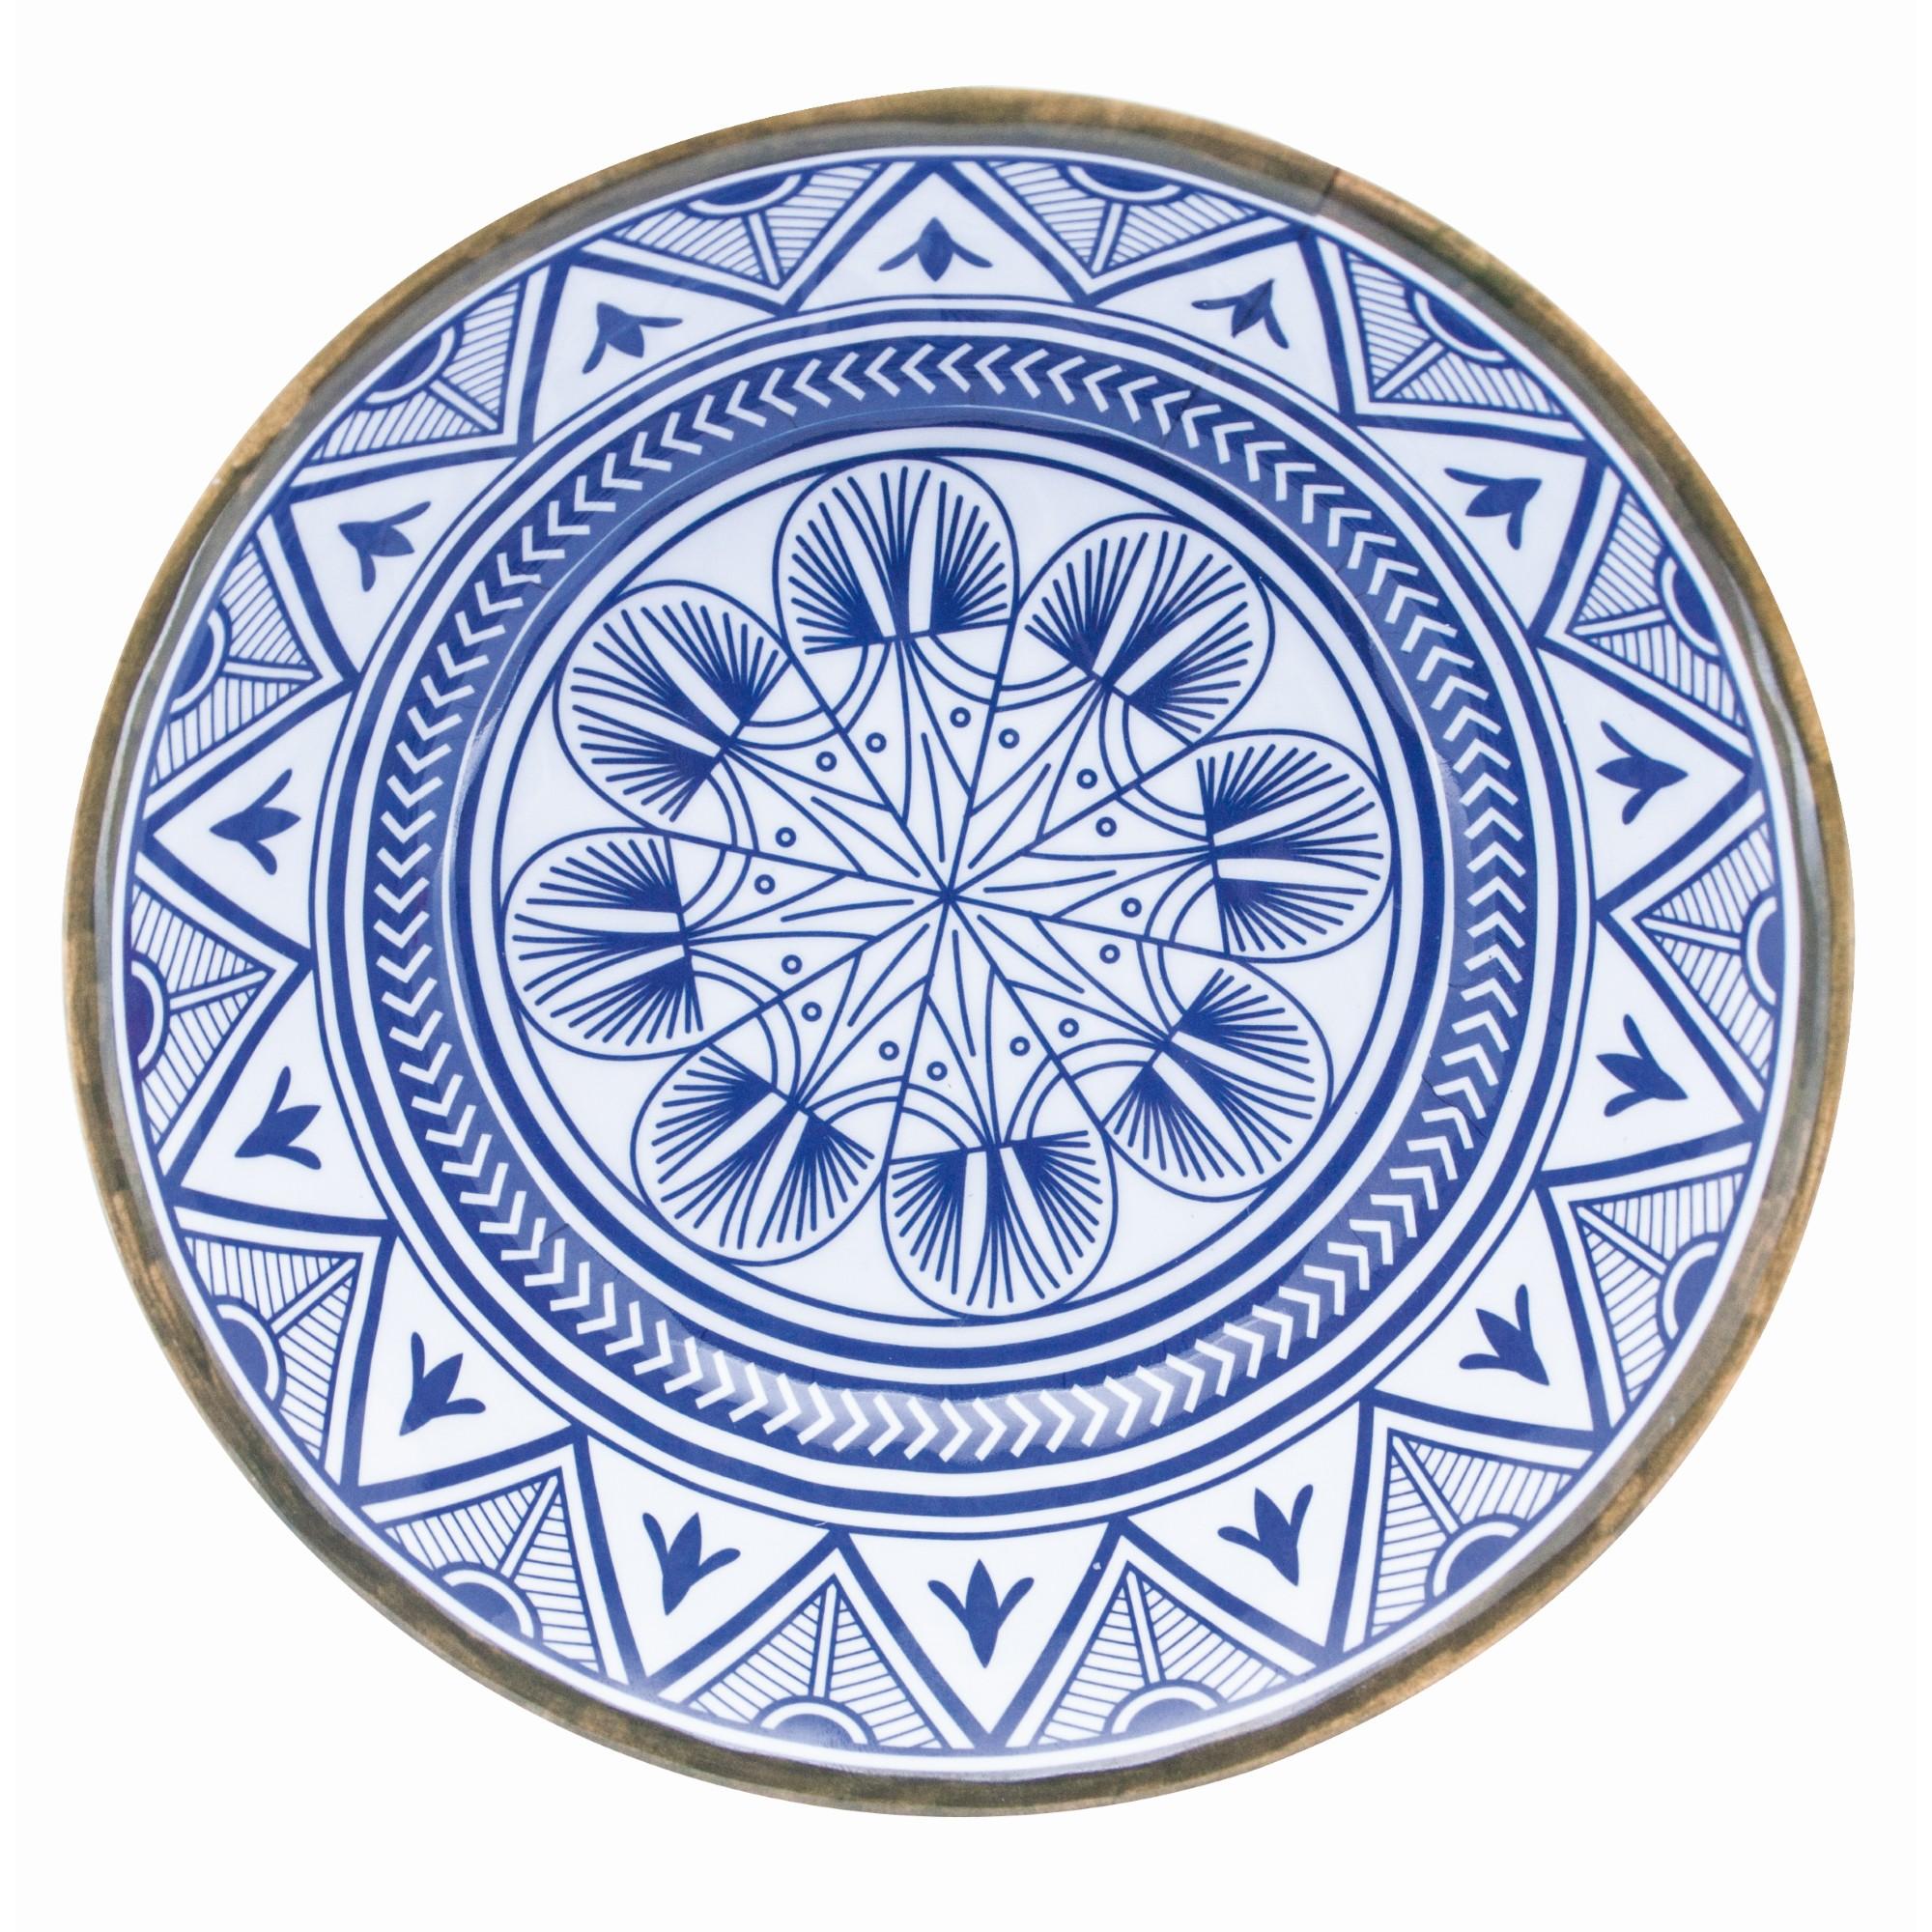 Prato Raso Redondo em Melamina Etnica Azul 27cm - Mimo Style